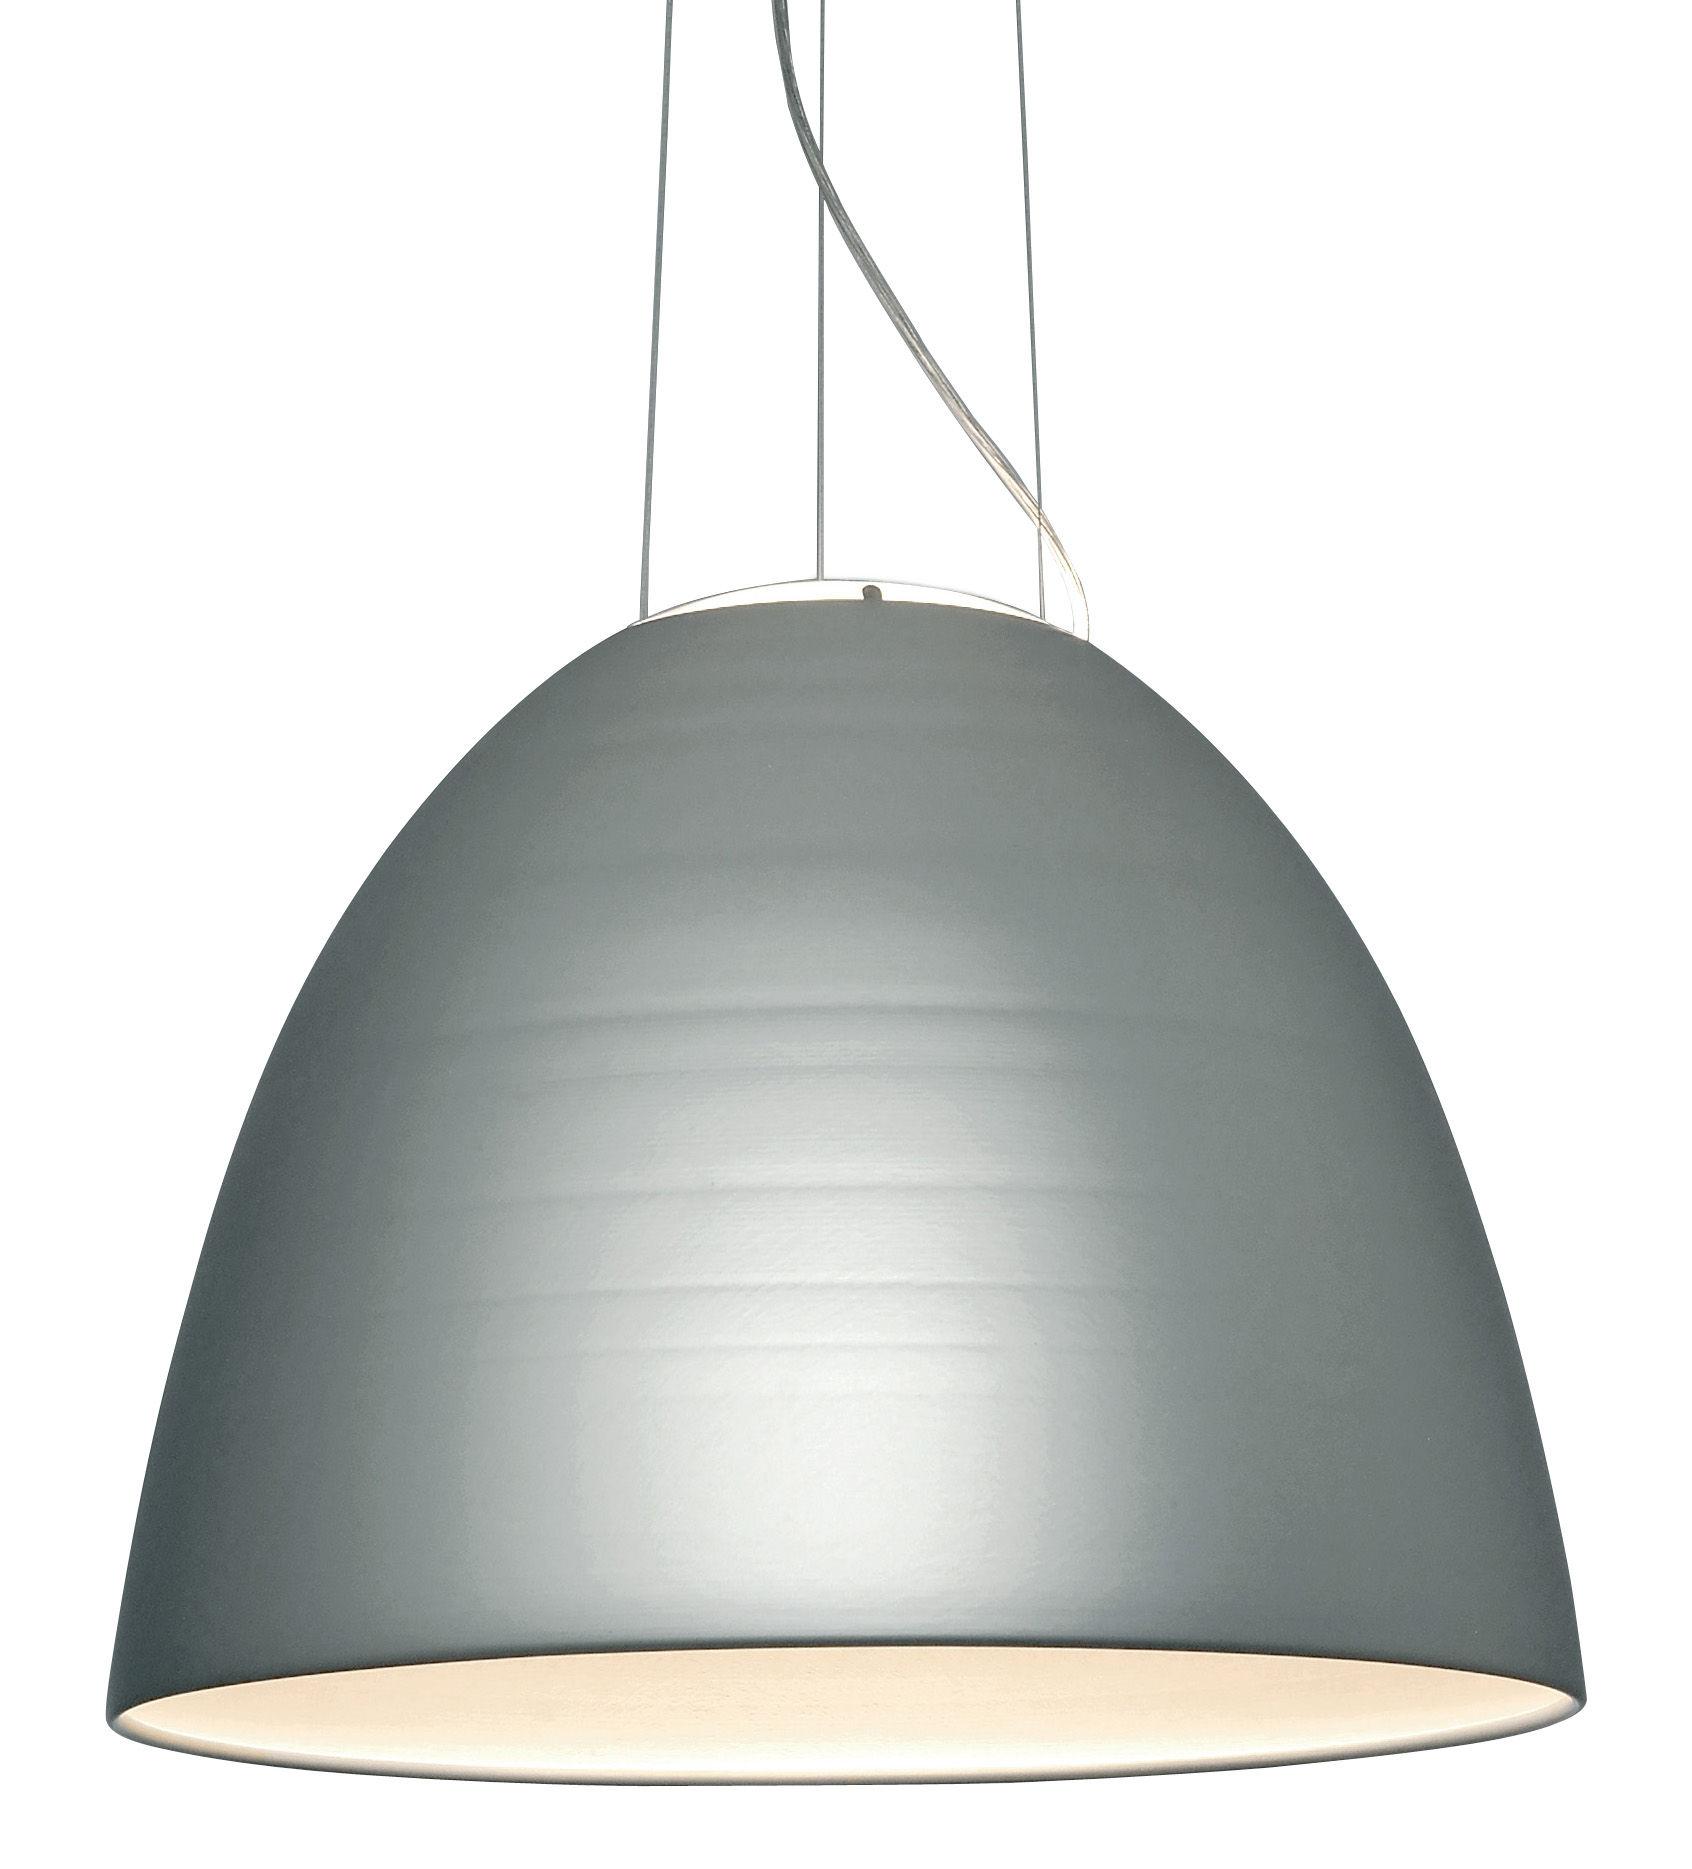 Lighting - Pendant Lighting - Nur LED Pendant by Artemide - Anodized aluminium - Aluminium, Glass